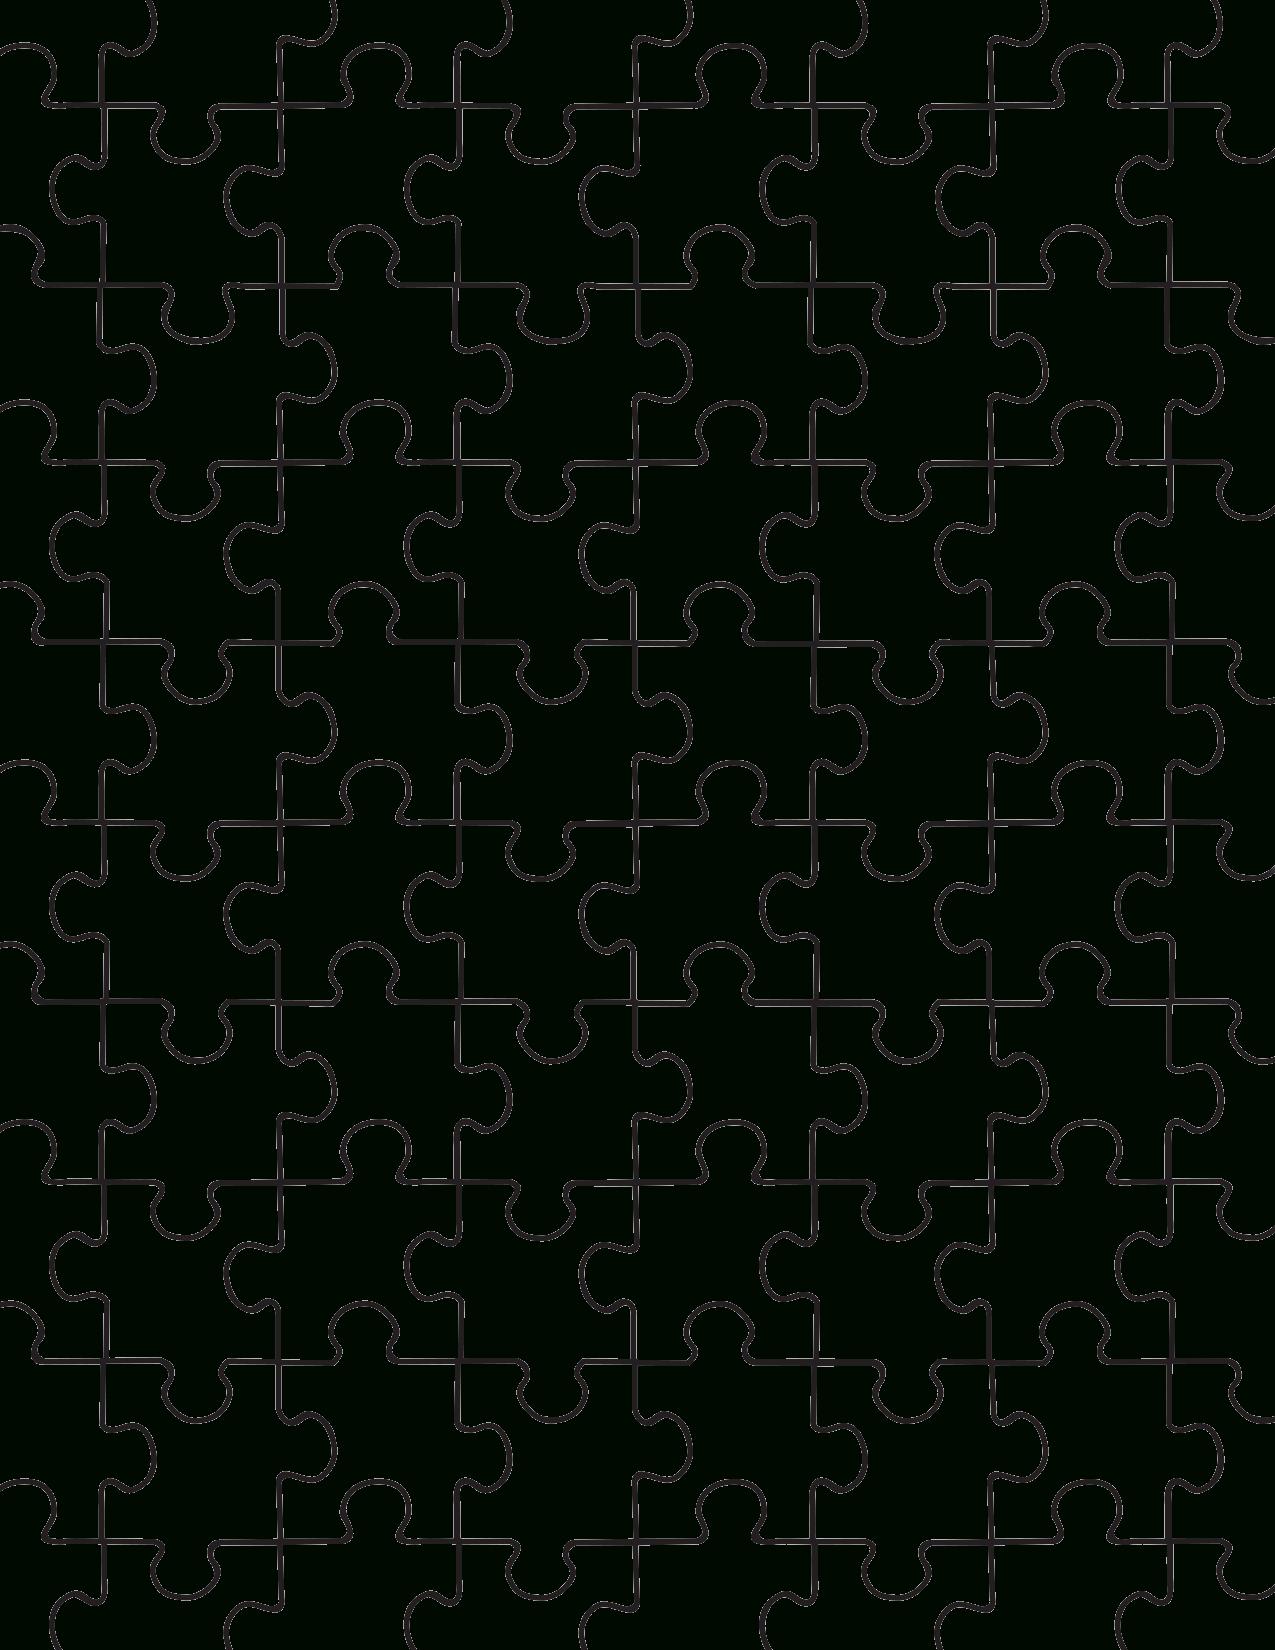 Printable Puzzle Pieces Template | Lovetoknow - Printable Jigsaw Puzzle Pdf